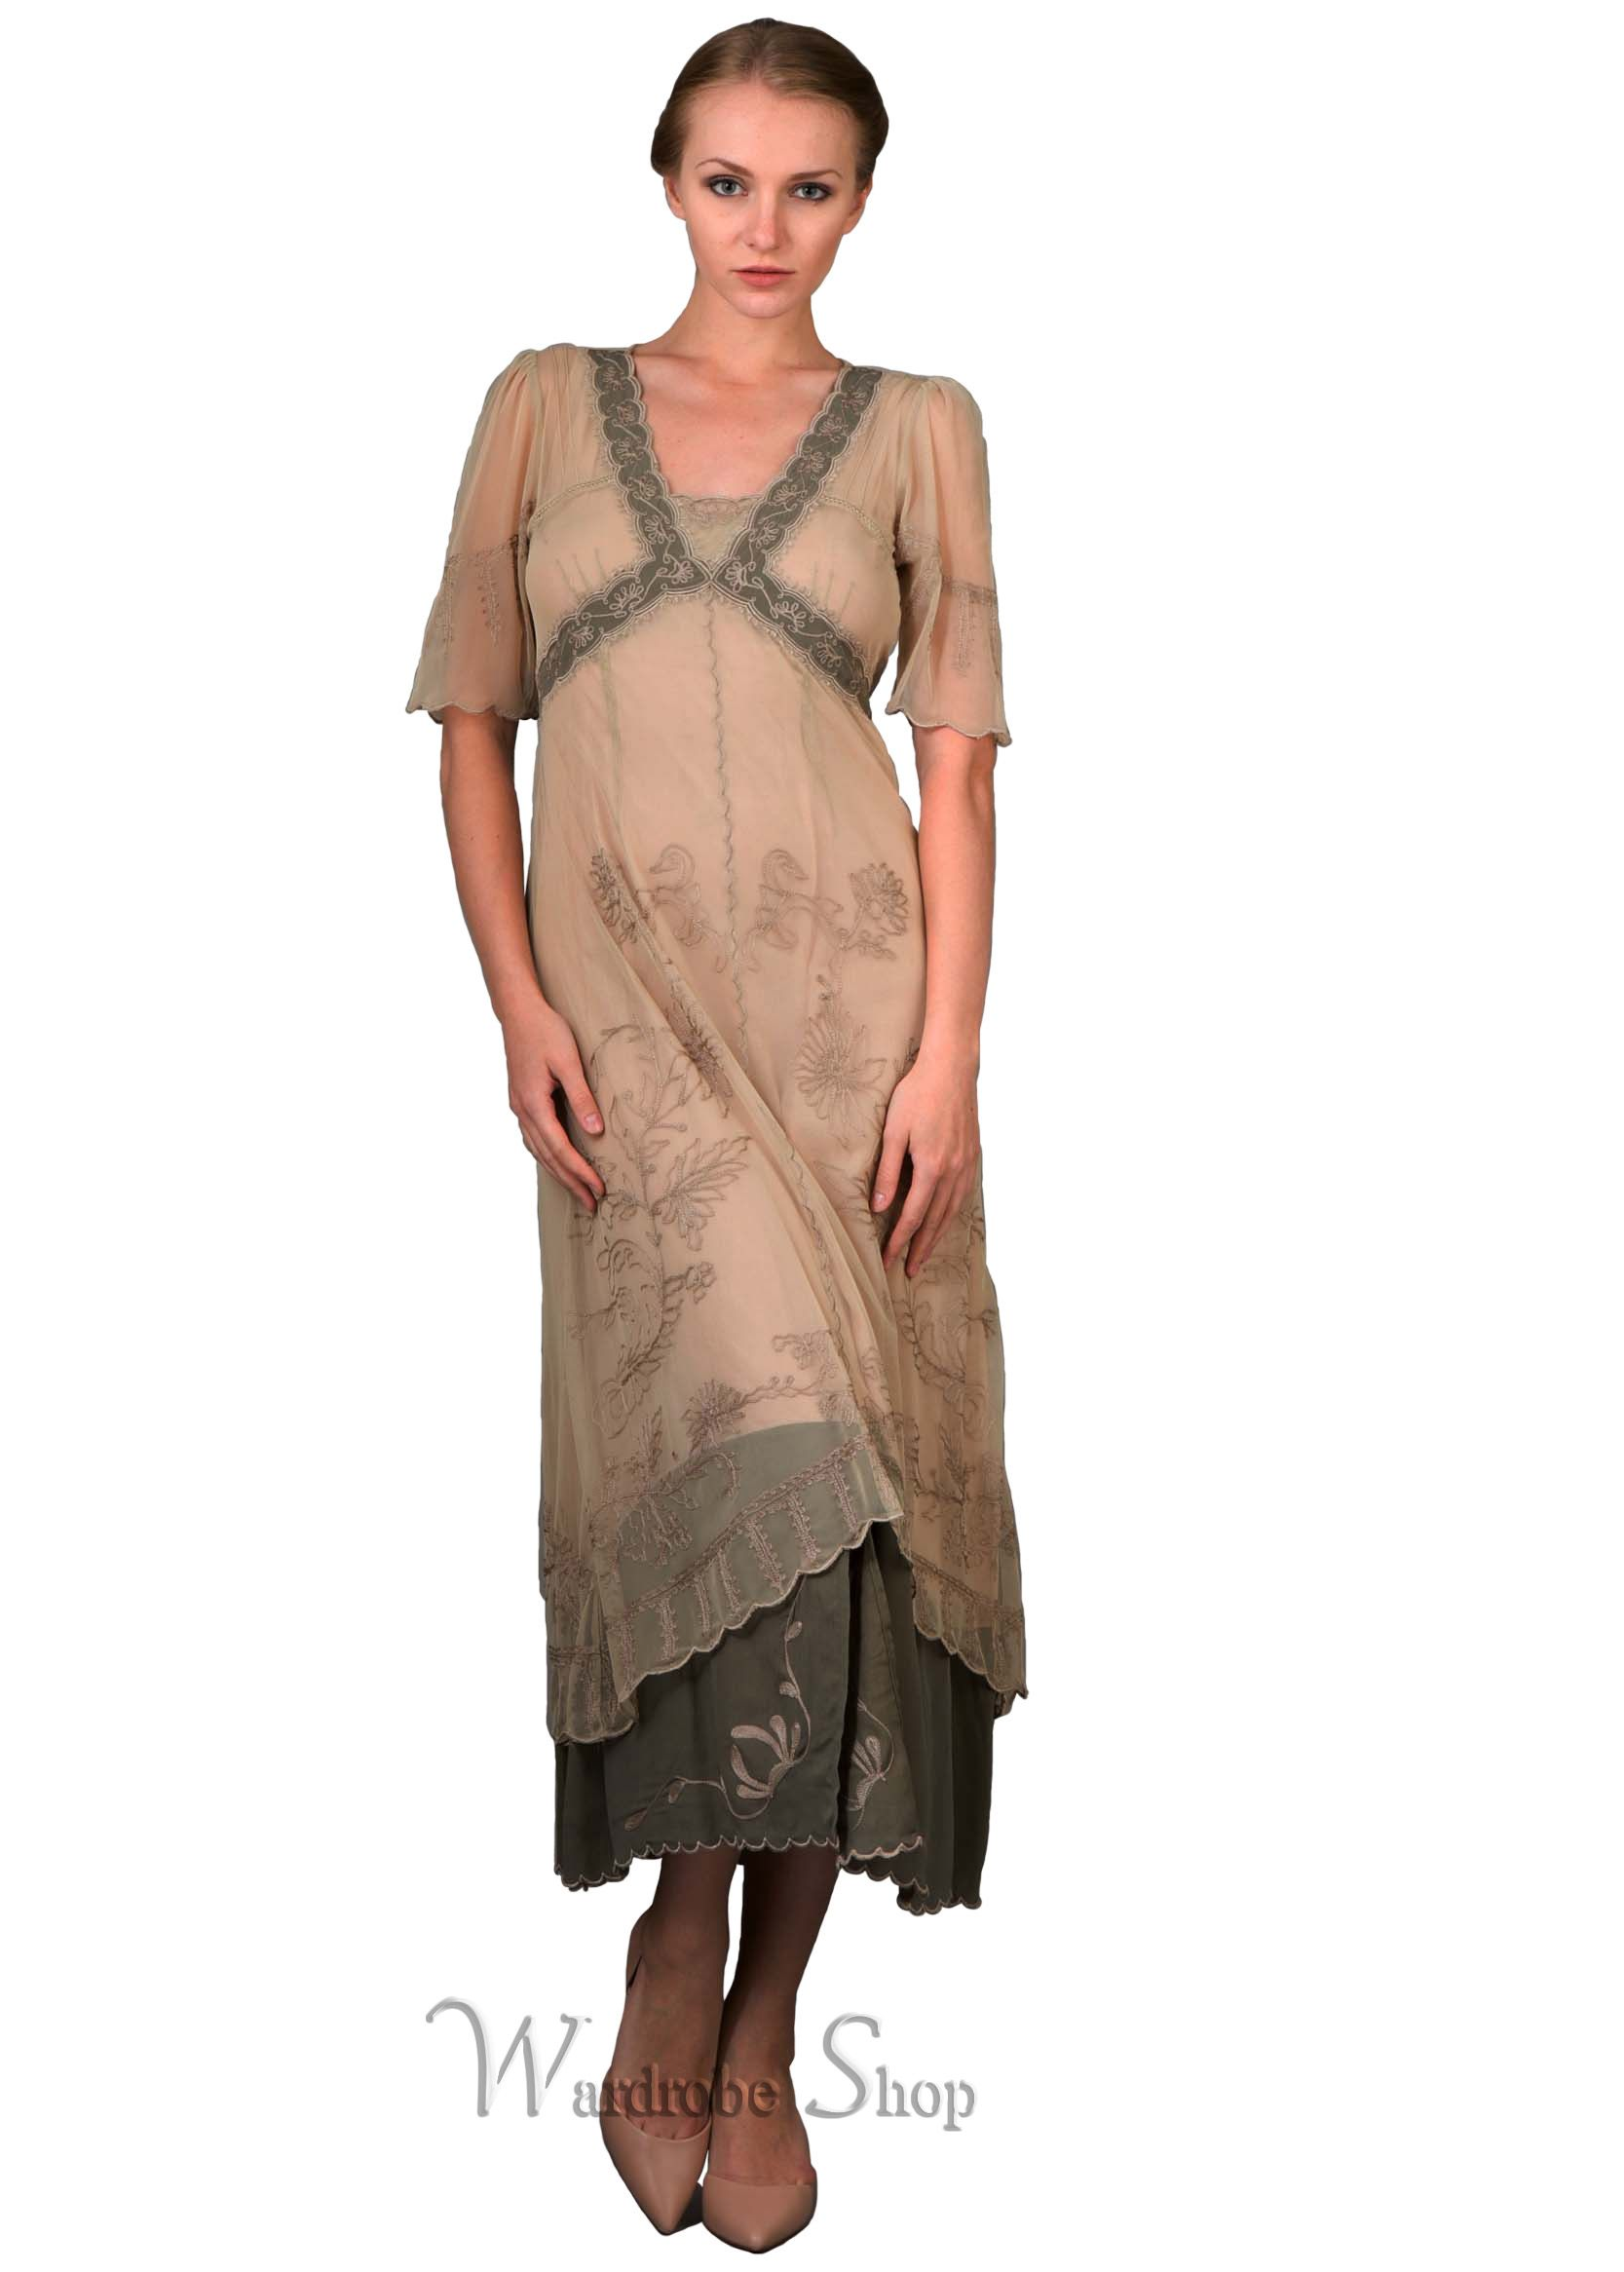 New Vintage Titanic Tea Party Dress In Sage By Nataya Nataya Dress Victorian Fashion Dresses Dresses [ 2332 x 1667 Pixel ]